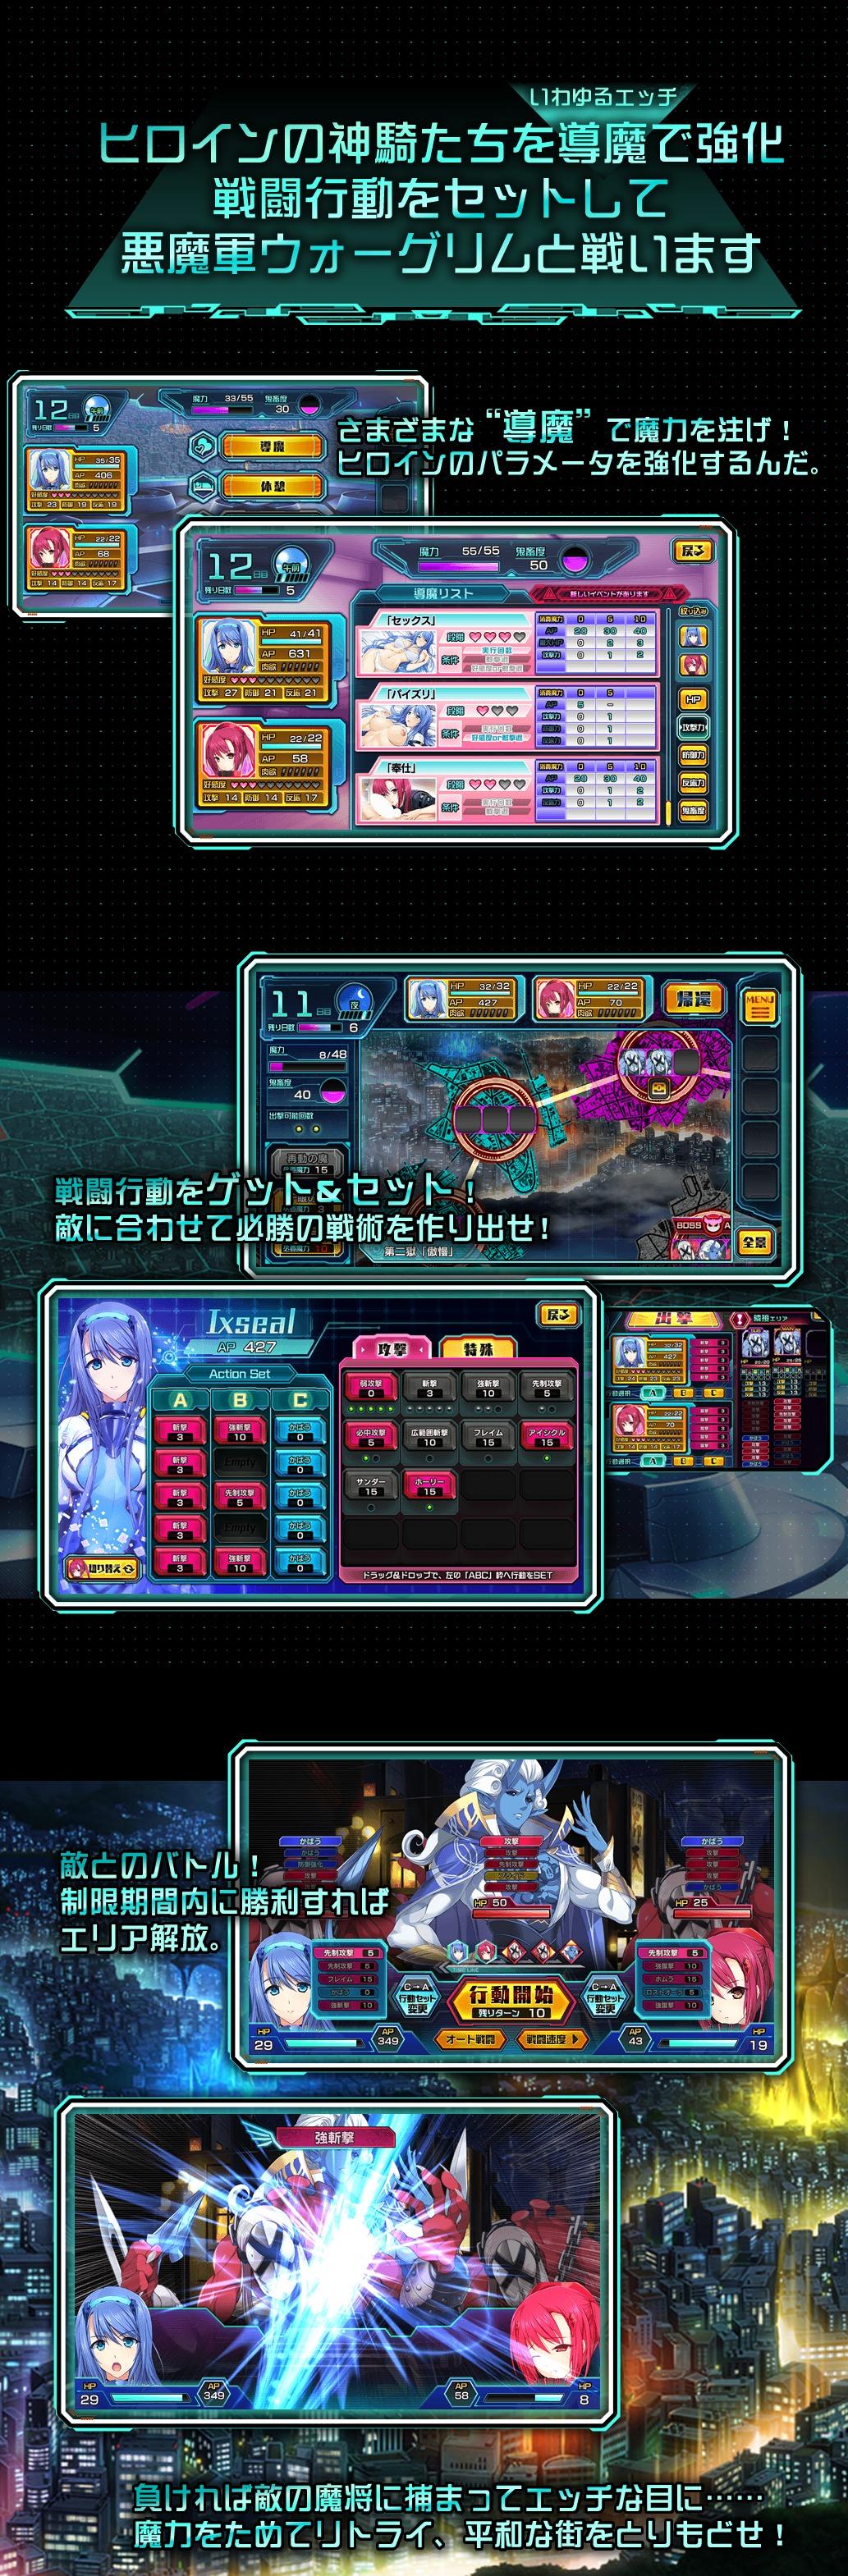 GAME SYSTEM(ゲームシステム) 超昂神騎エクシール